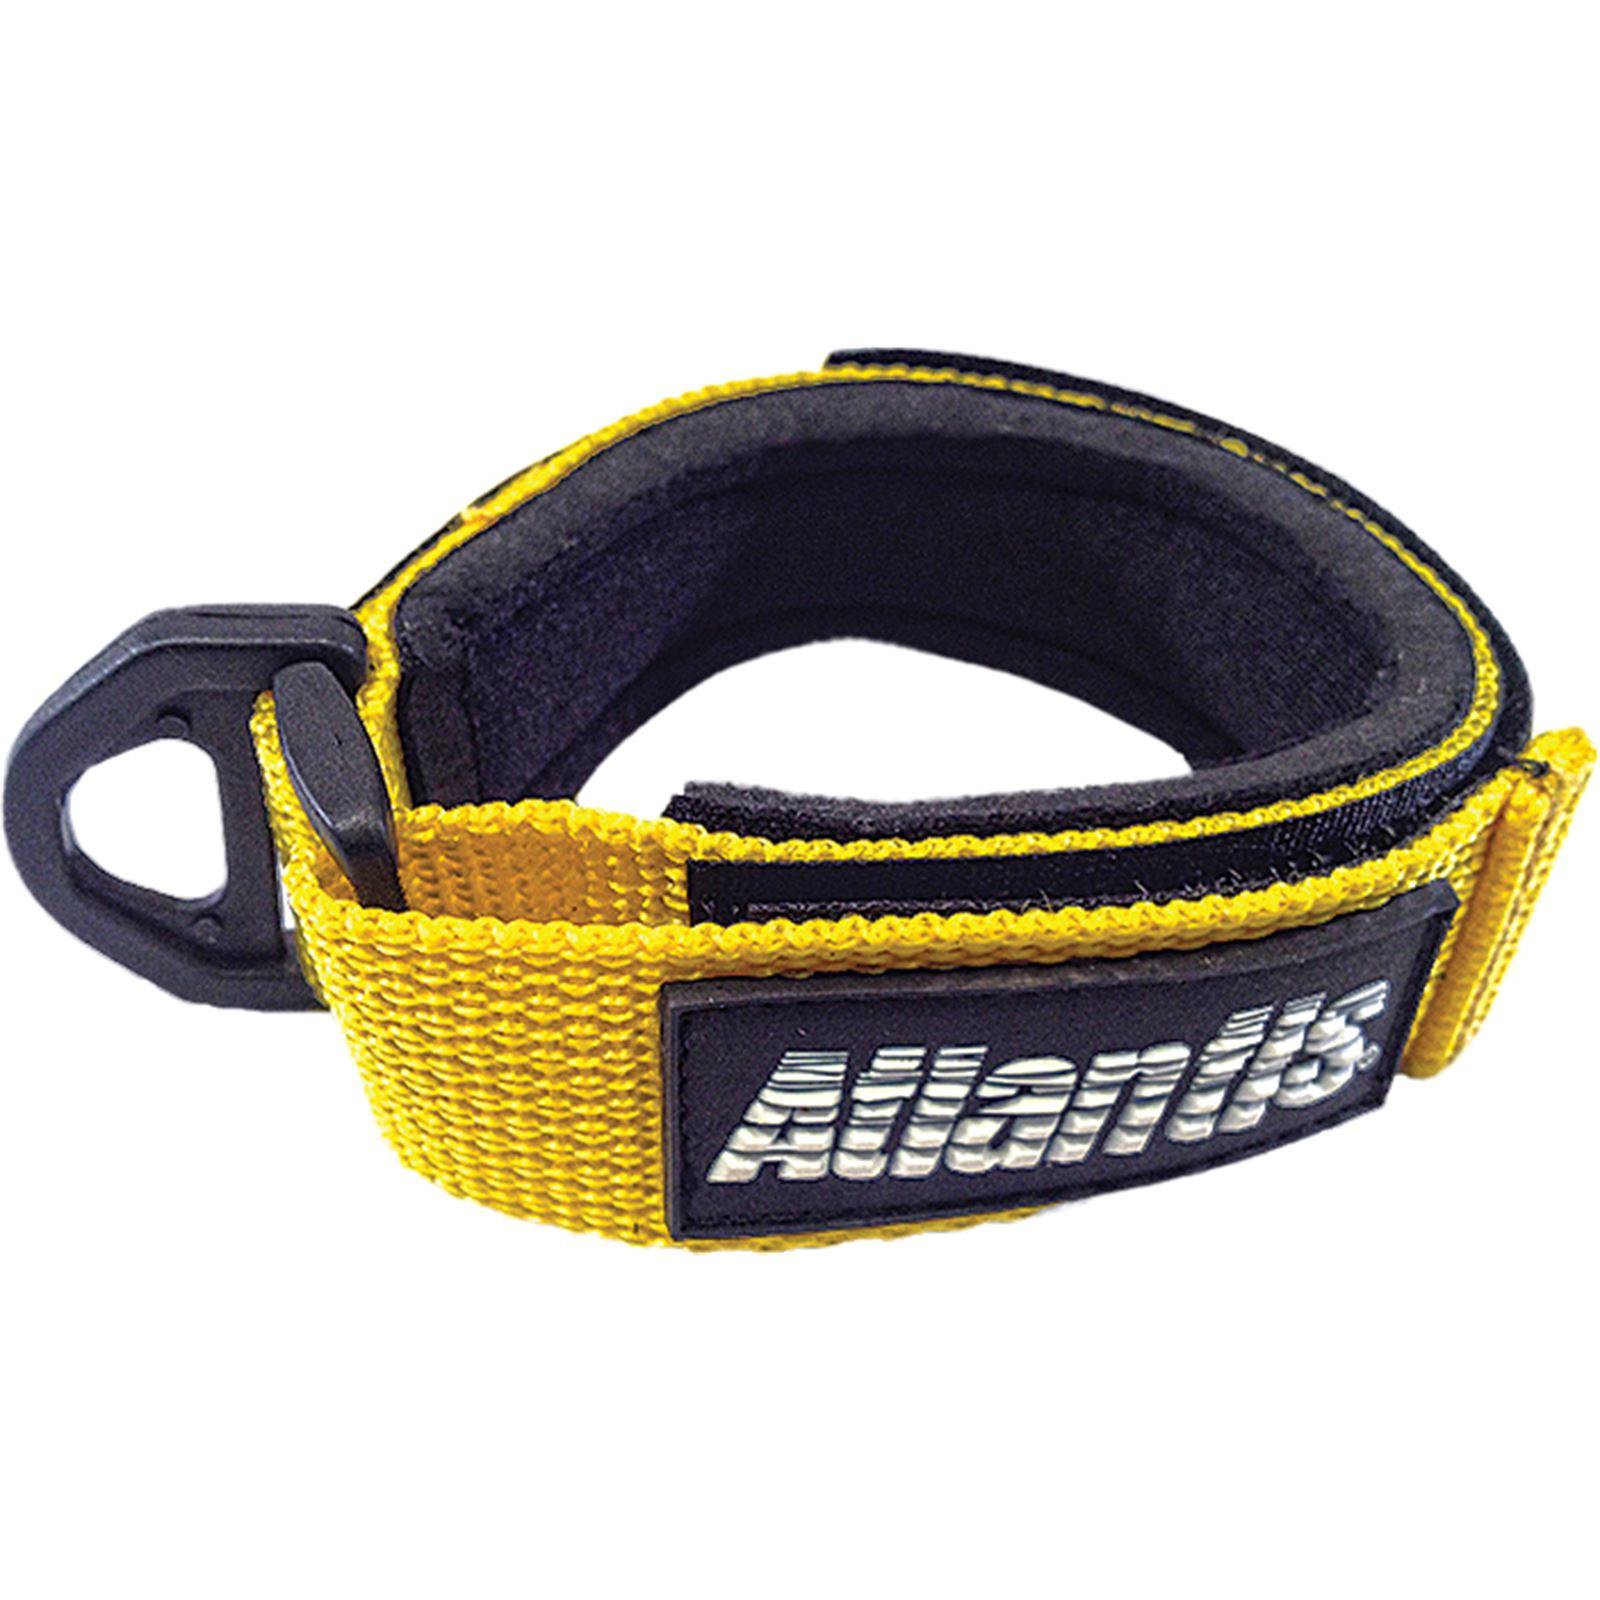 Atlantis Pro Floating Lanyard Wrist Band